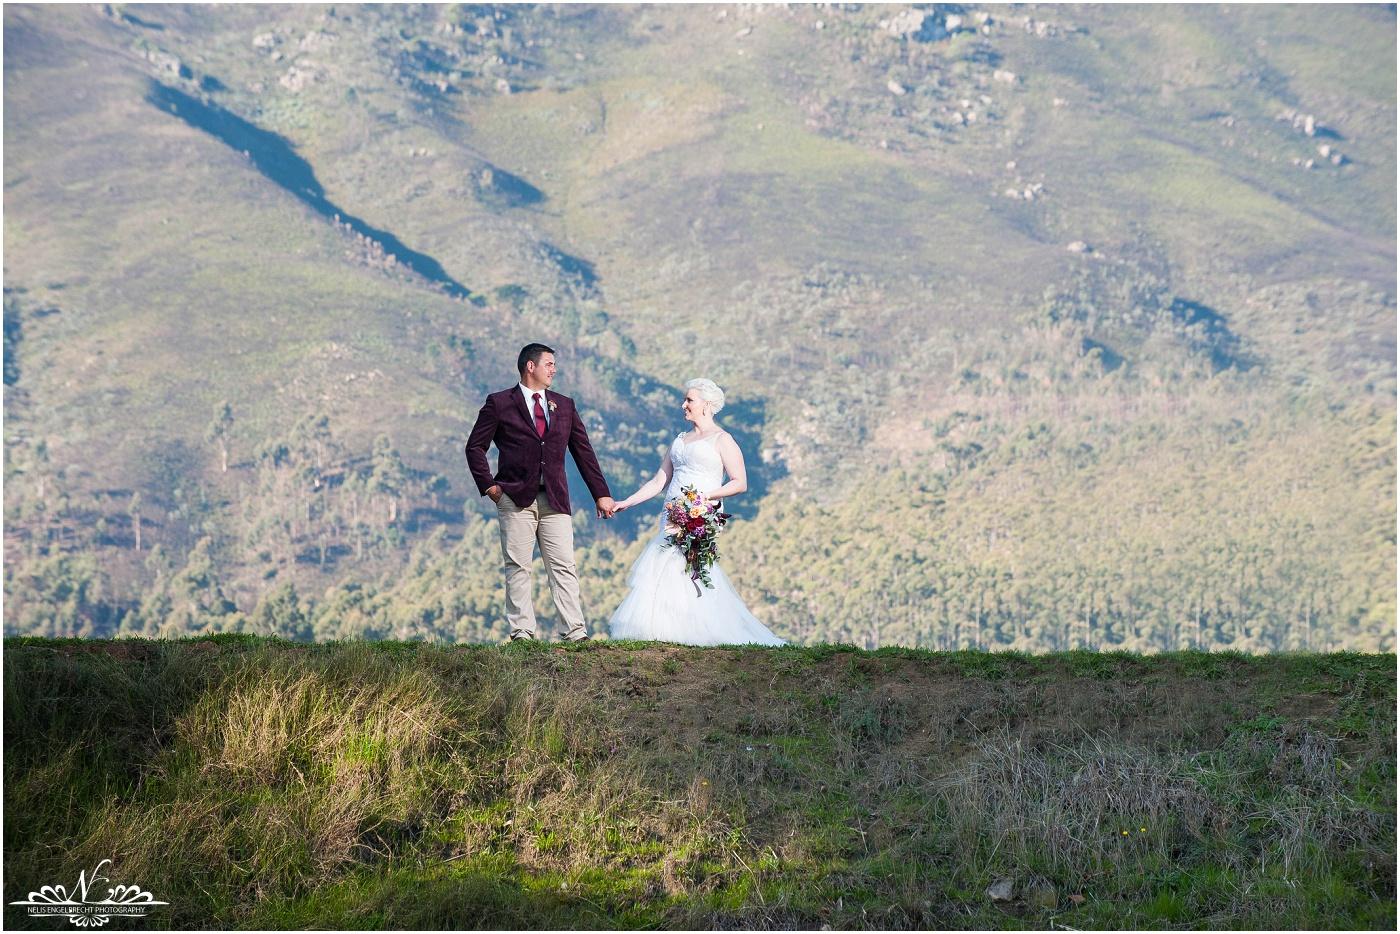 Langkloof-Roses-Wedding-Photos-Nelis-Engelbrecht-Photography-108